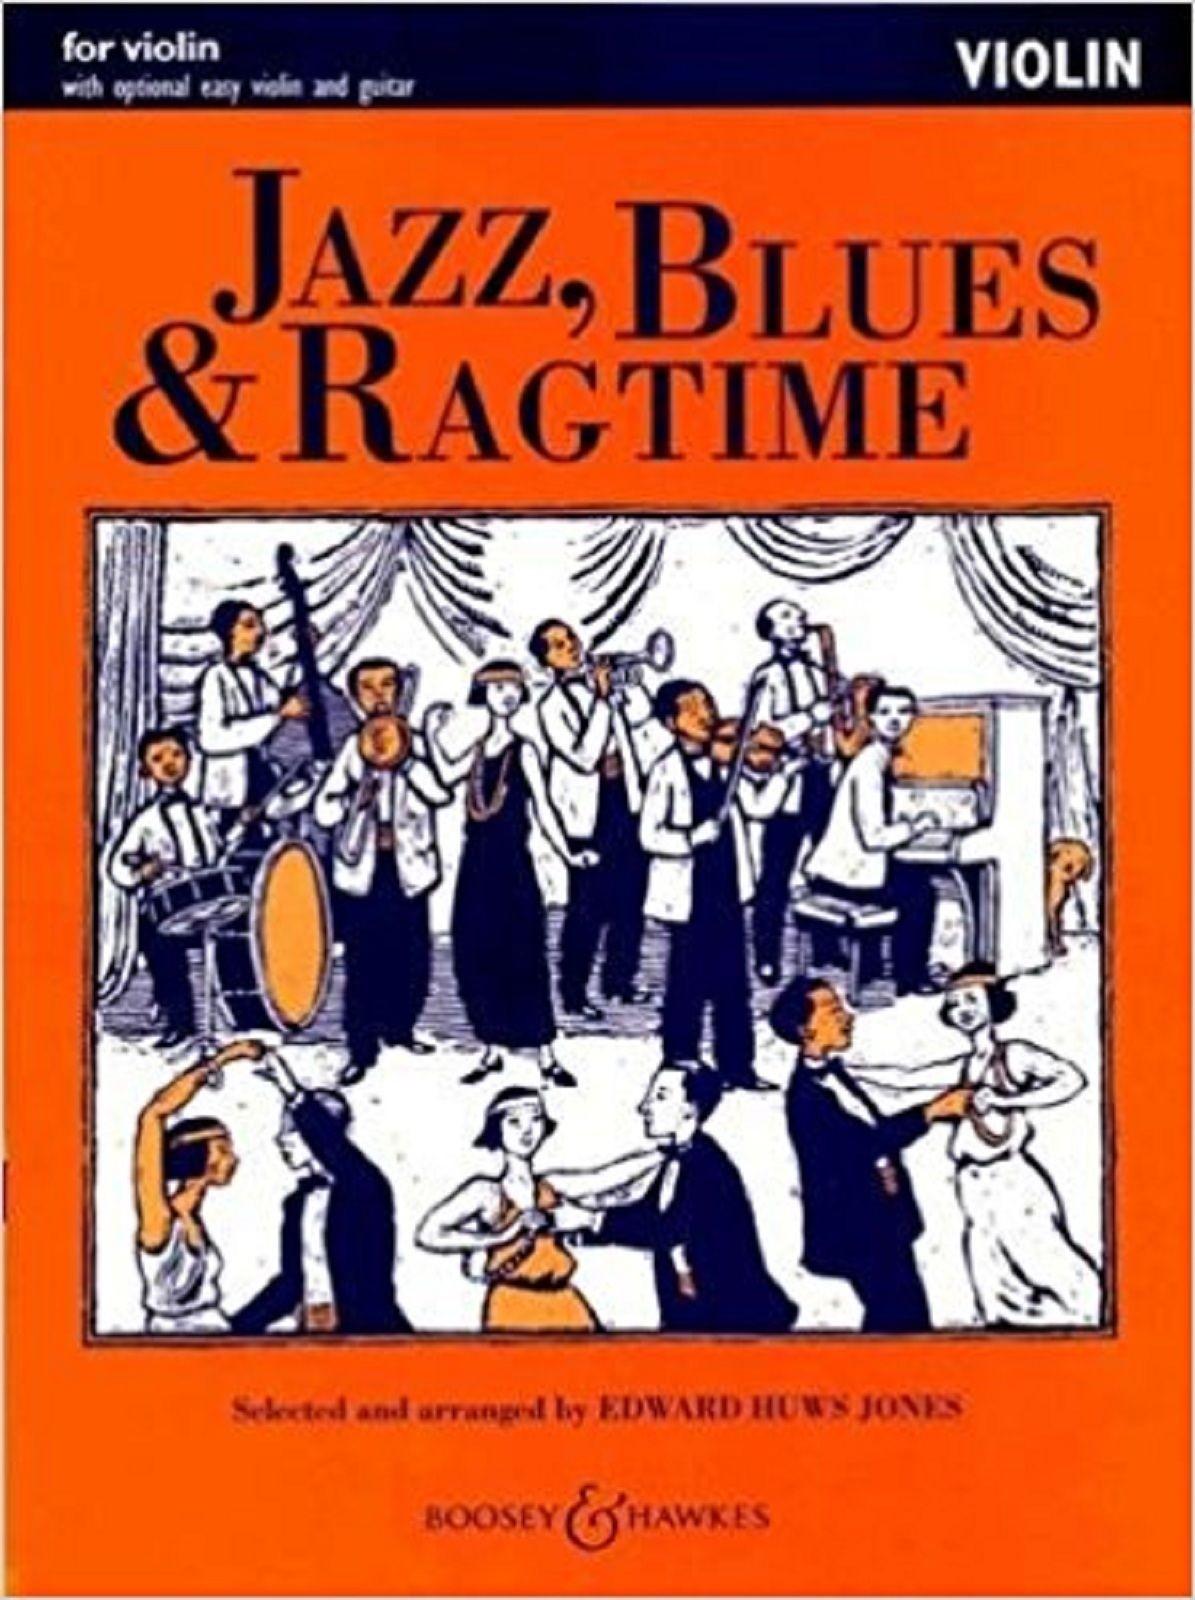 Jazz Blues & Ragtime Violin Optional Easy Violin Guitar Sheet Music Book S171